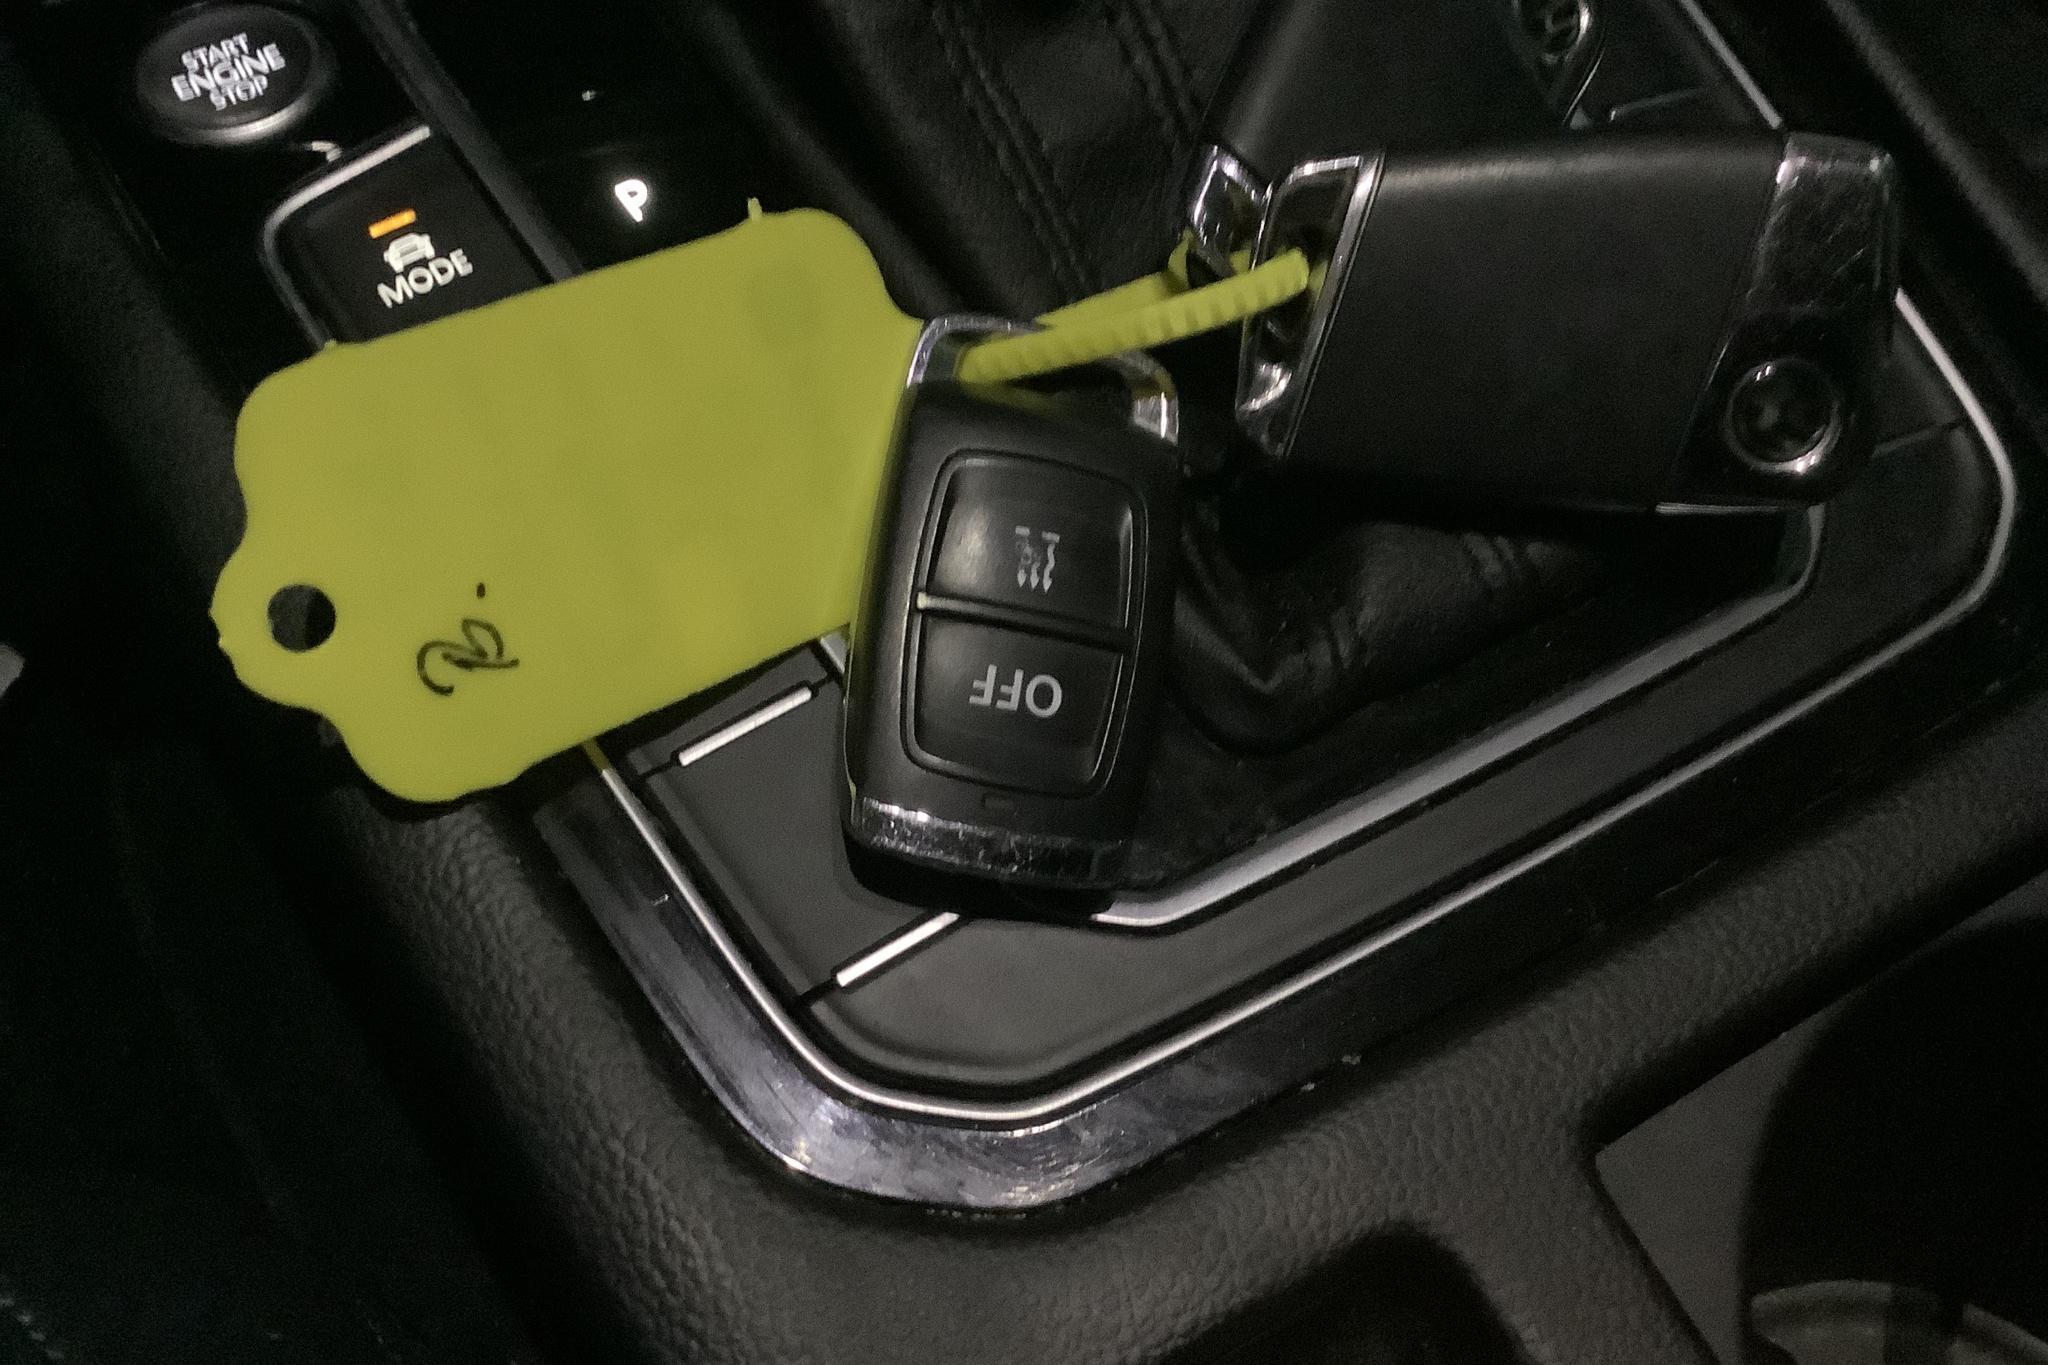 VW Passat 2.0 TDI Sportscombi 4MOTION (190hk) - 137 400 km - Automatic - white - 2017